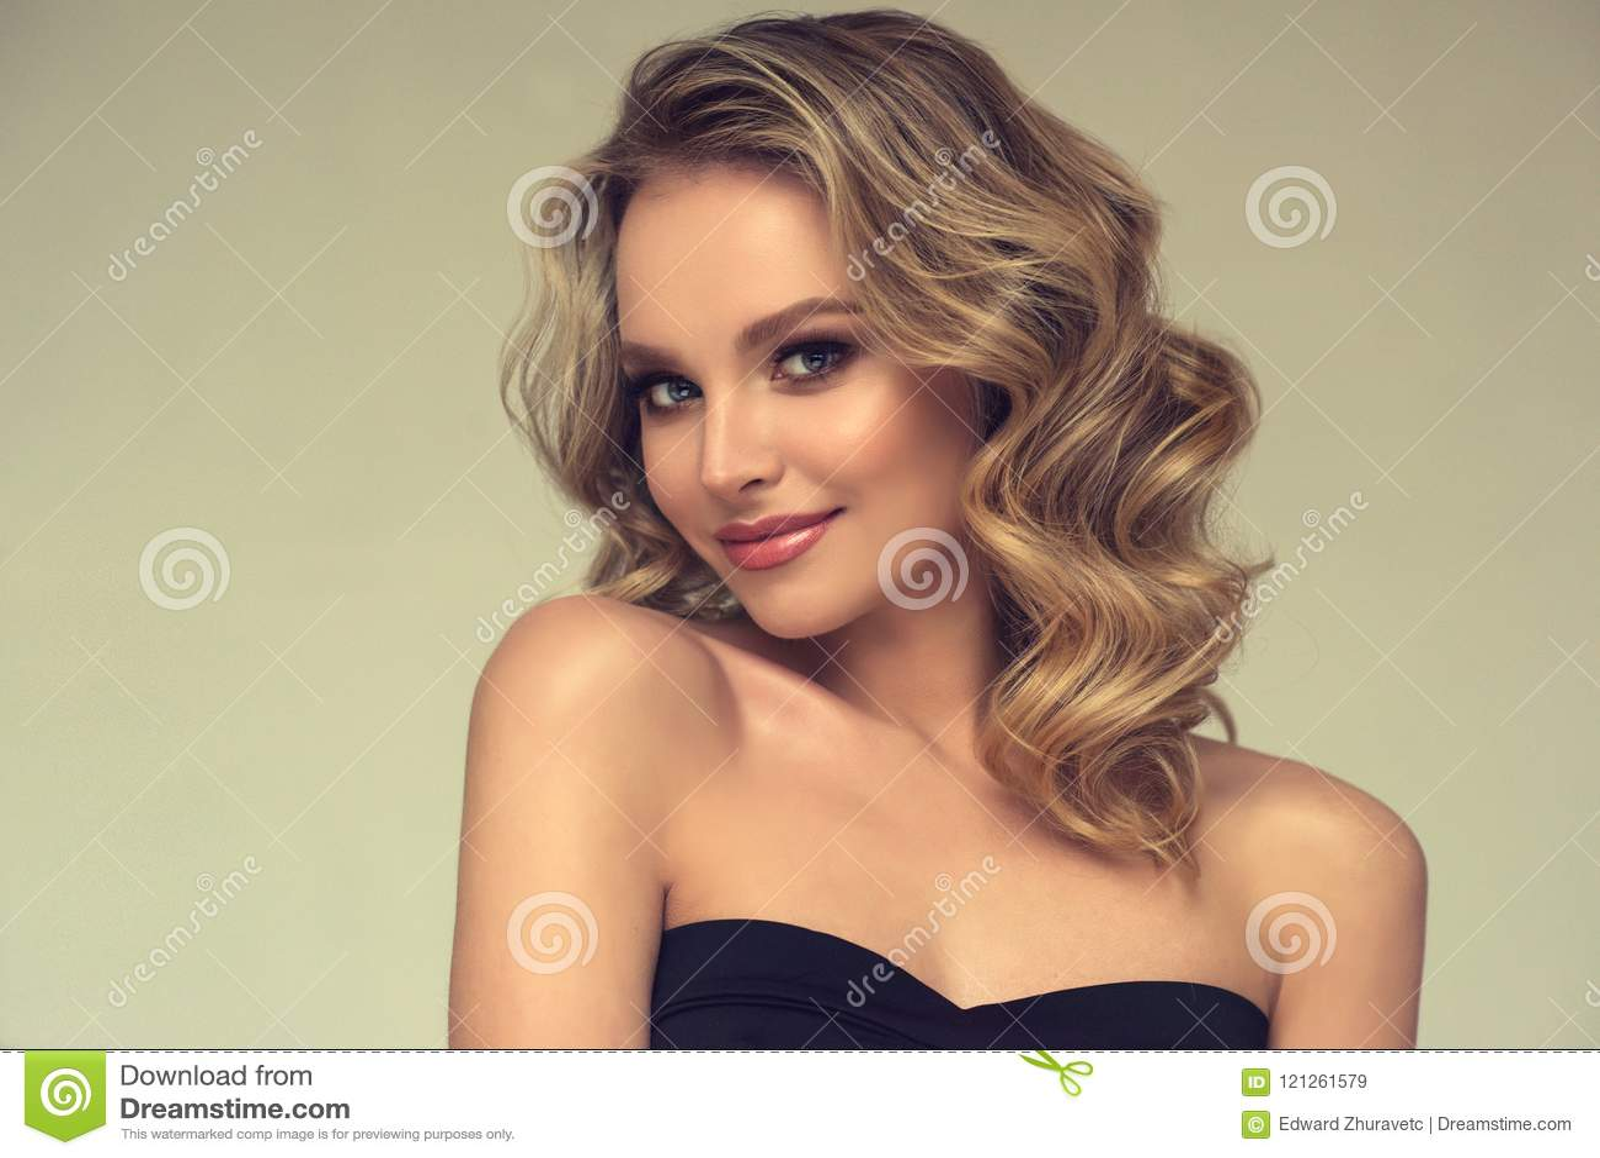 Vrij blond-haired model met krullend, los kapsel en aantrekkelijke make-up